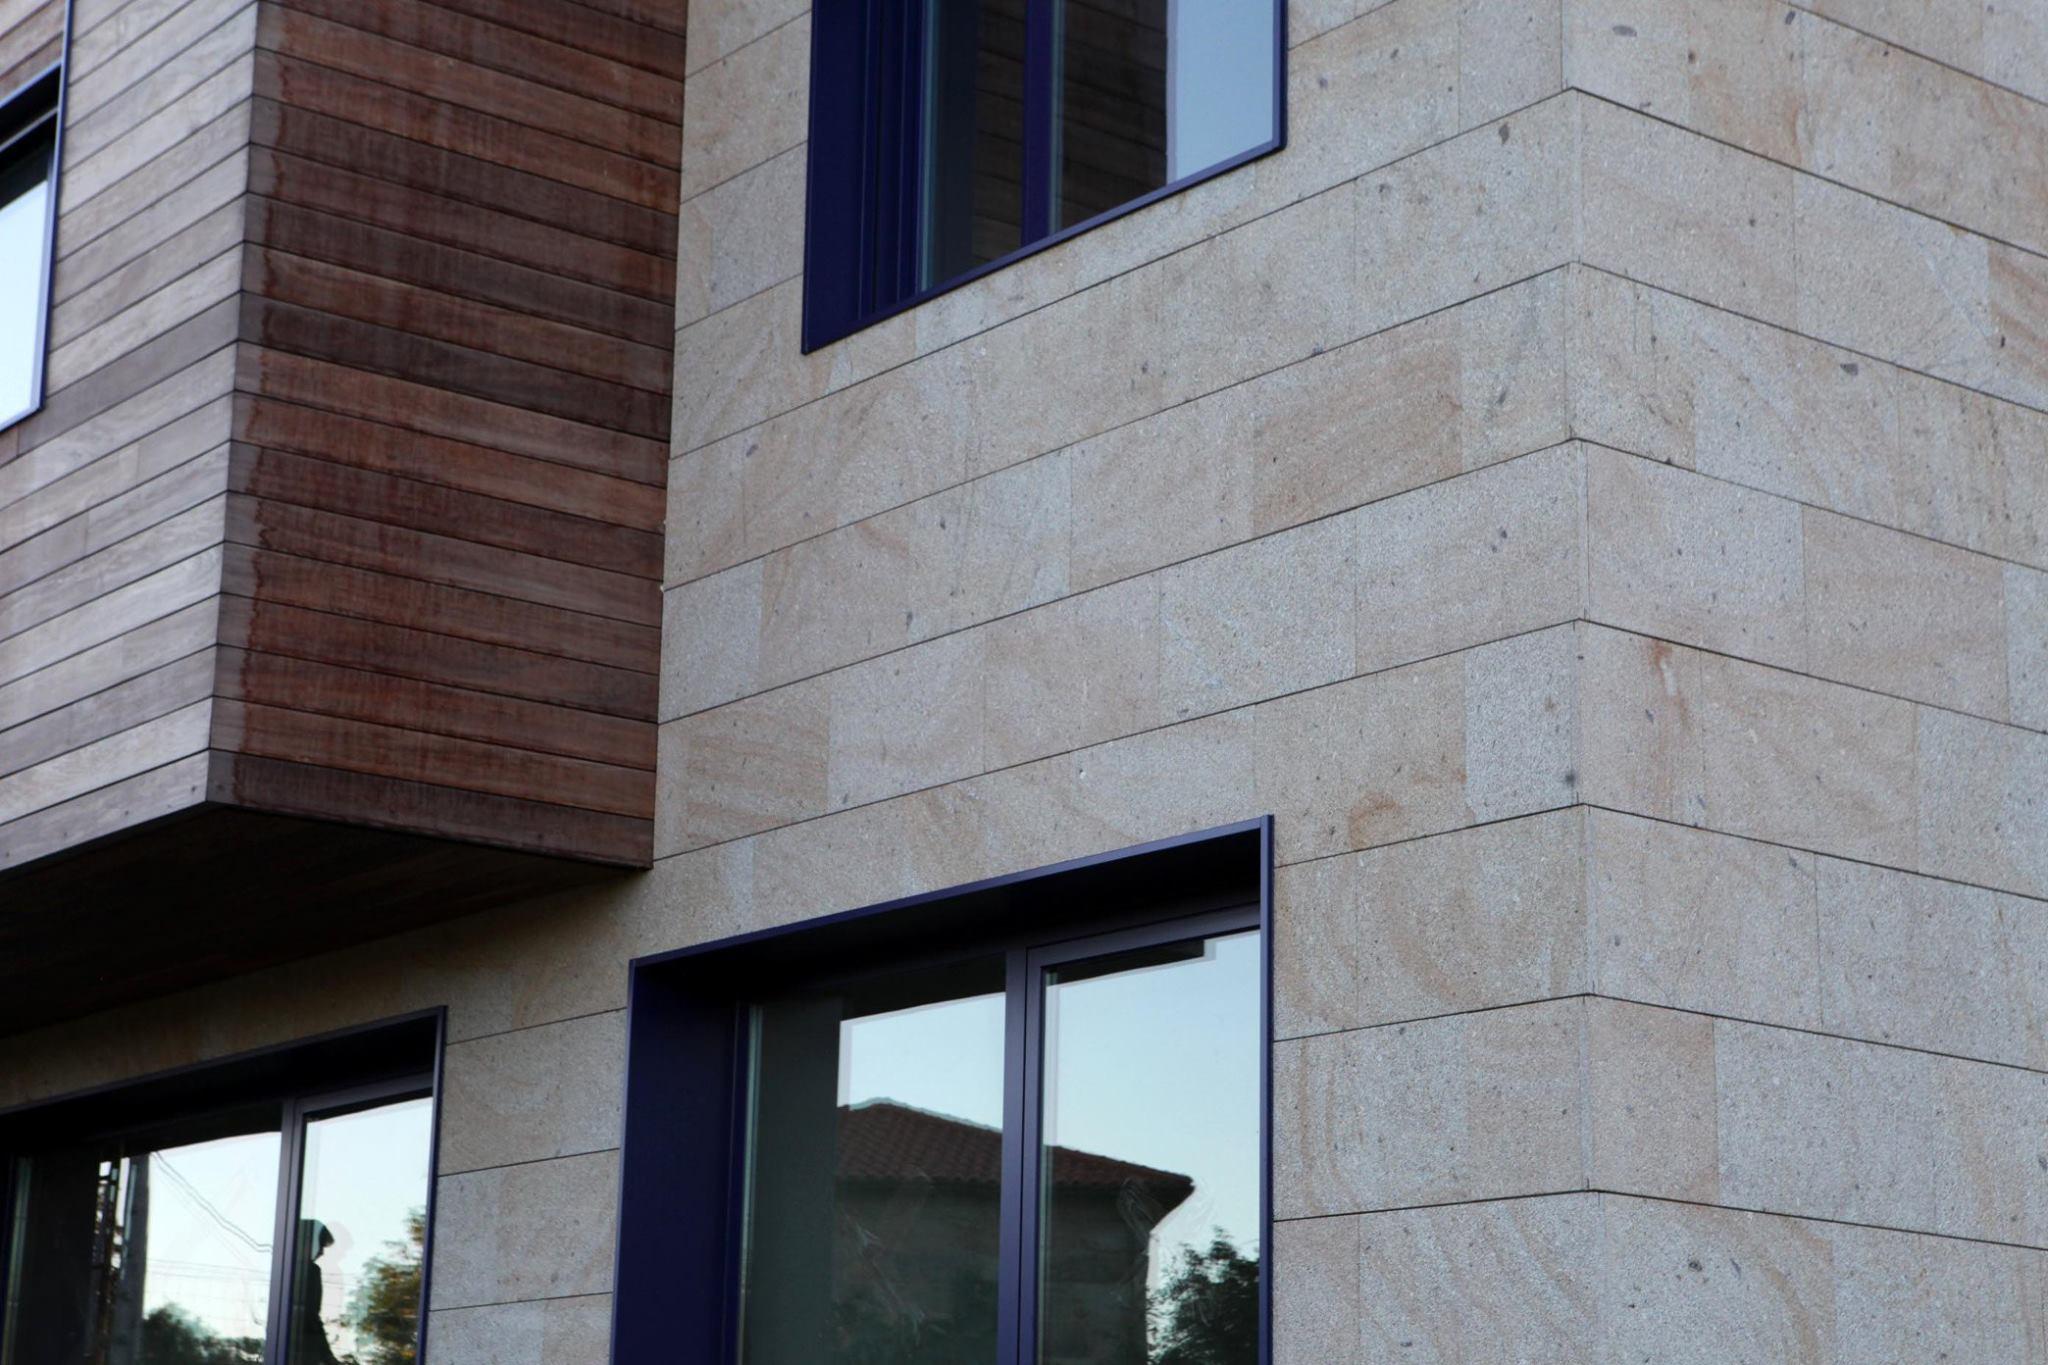 Fachada, Fachada de pedra, fachada com subestrutura, suportes e ancoragens para fachadas